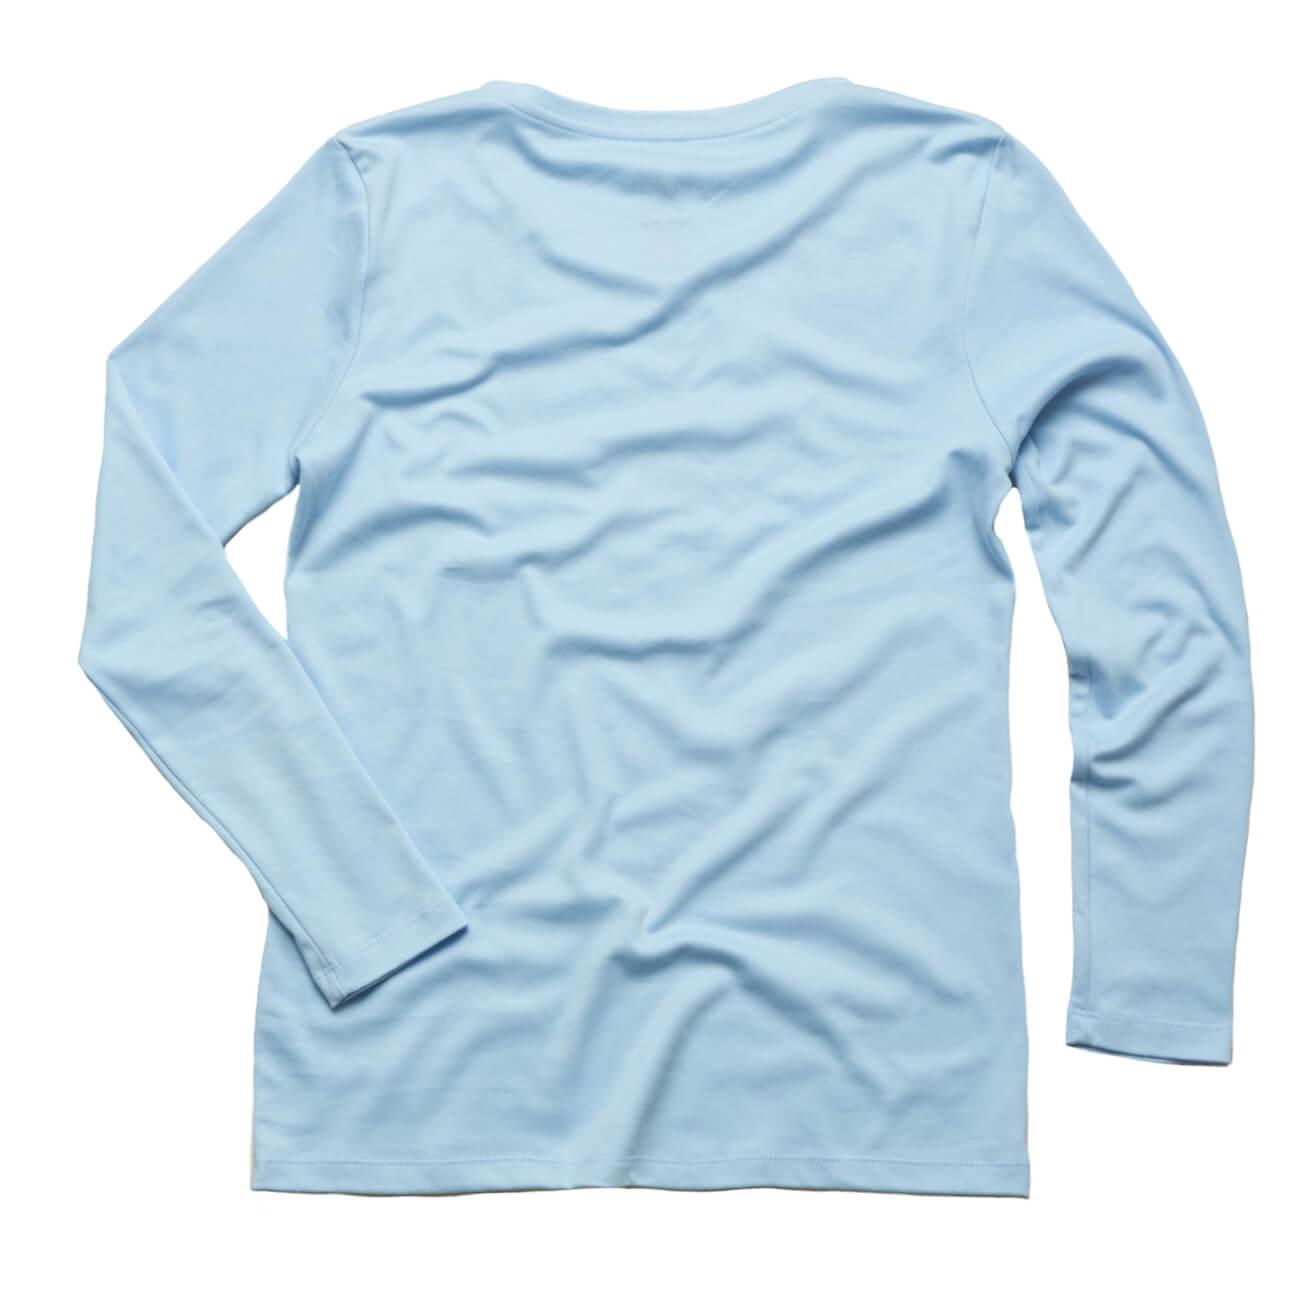 Franela basica Verticales caballero manga larga azul claro